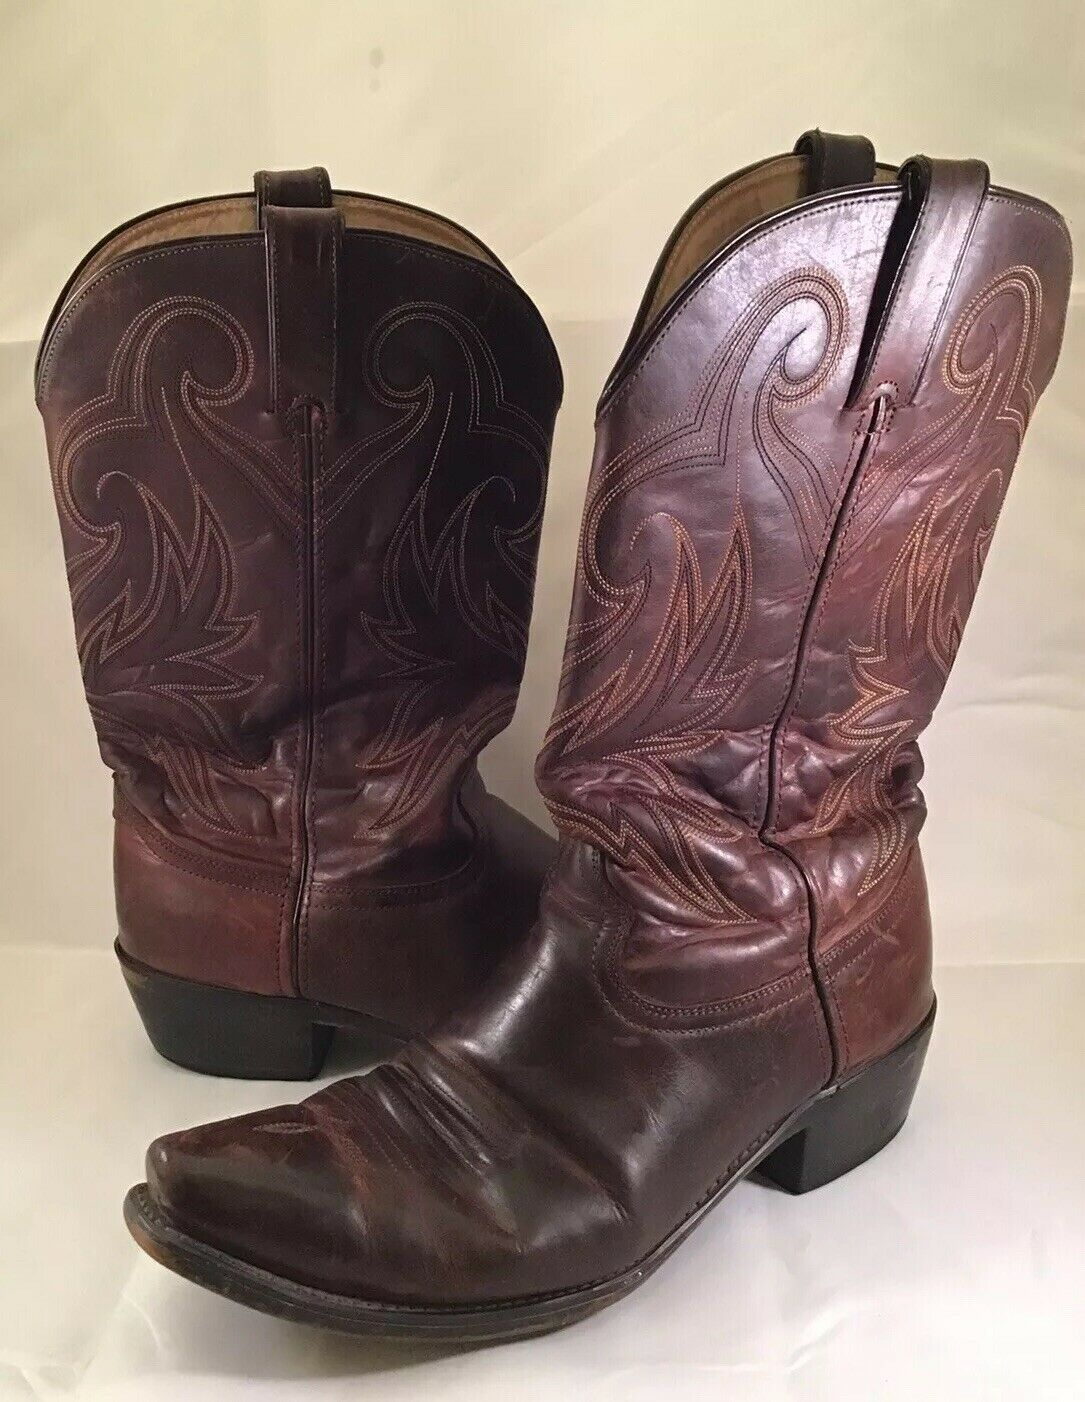 Durango Cowboy stivali Heel Snip Toe Sz 10.5 D